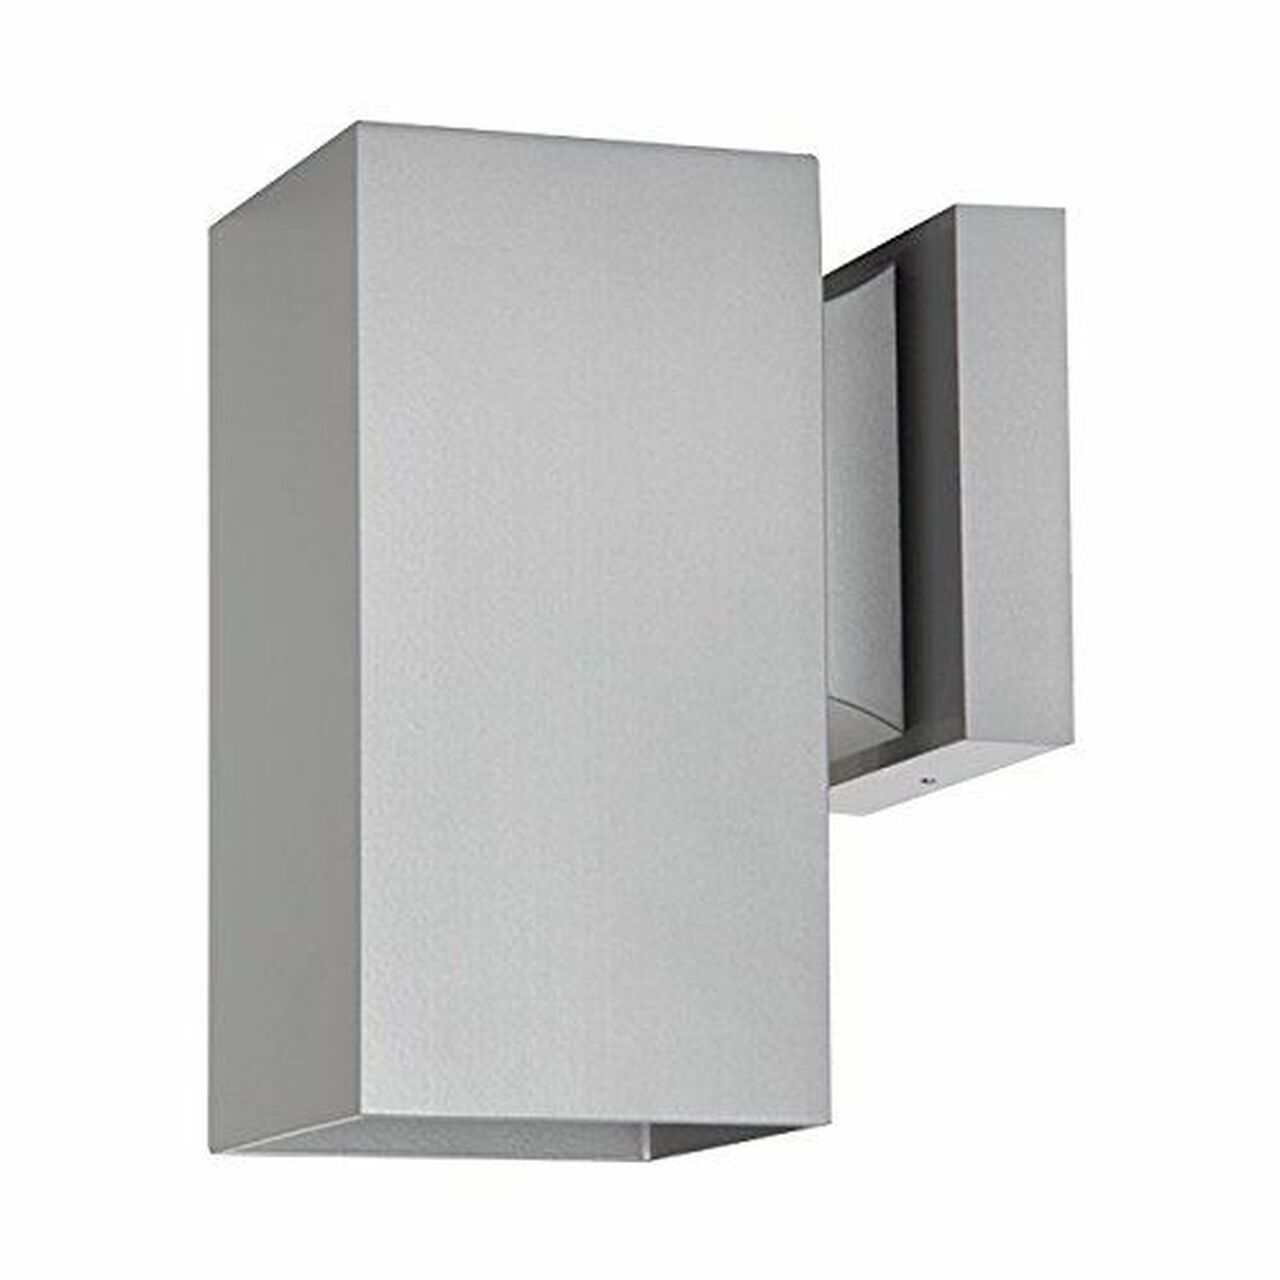 sunset f6891 58 1 light silver powder coat square aluminum exterior wall sconce